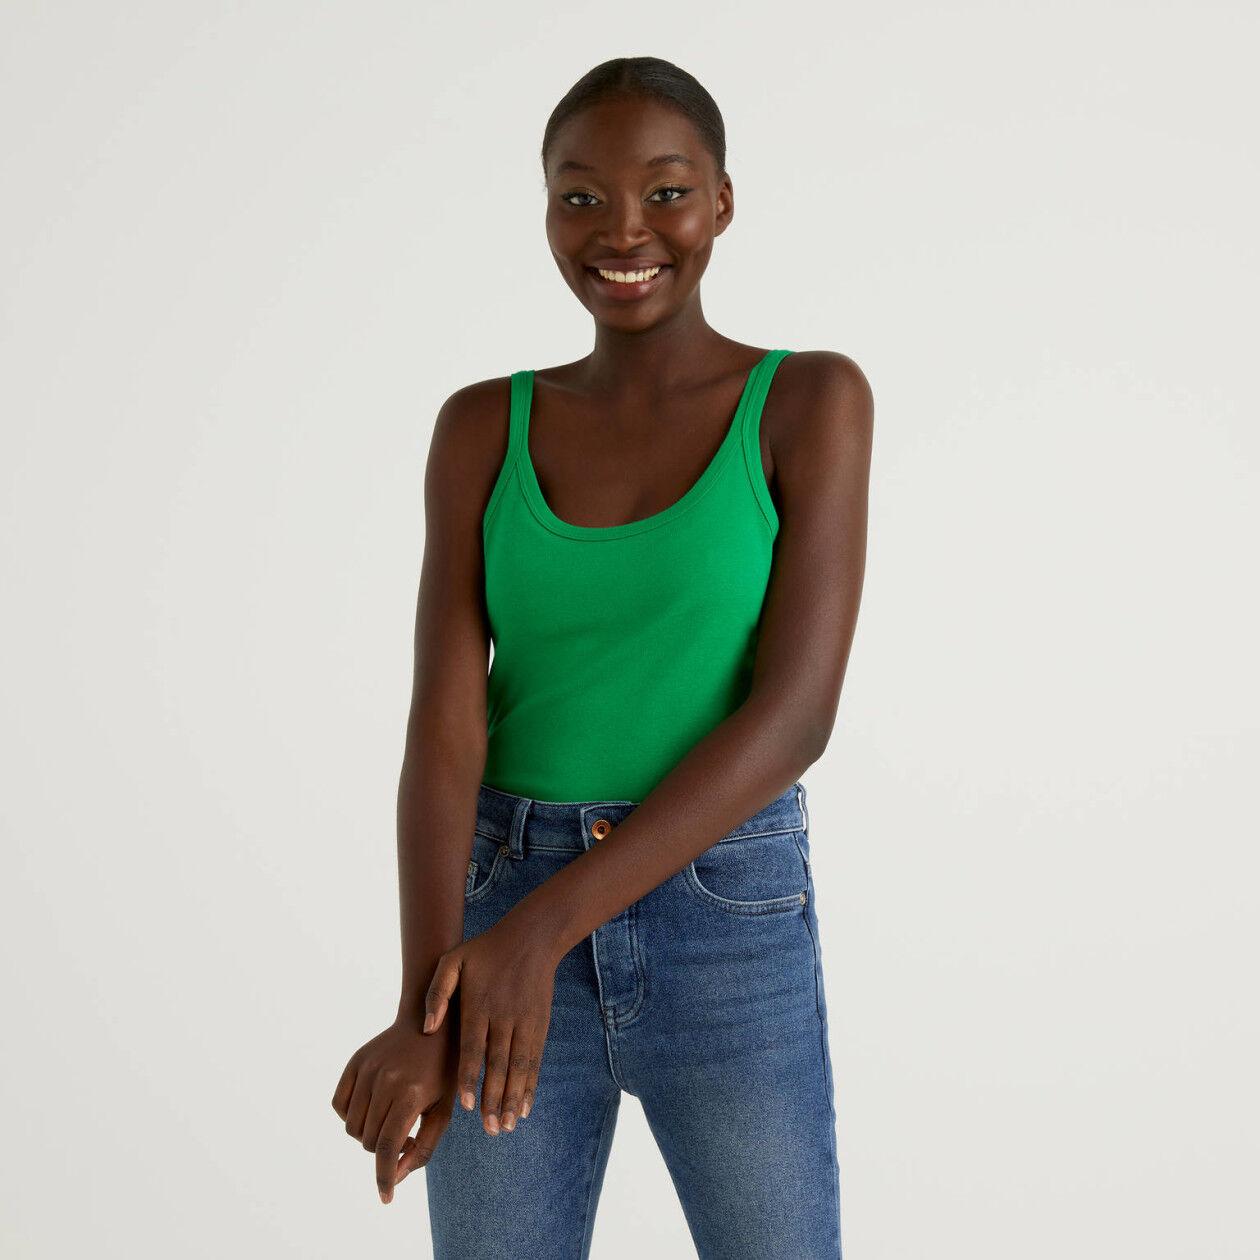 Camiseta de tirantes verde de algodón puro